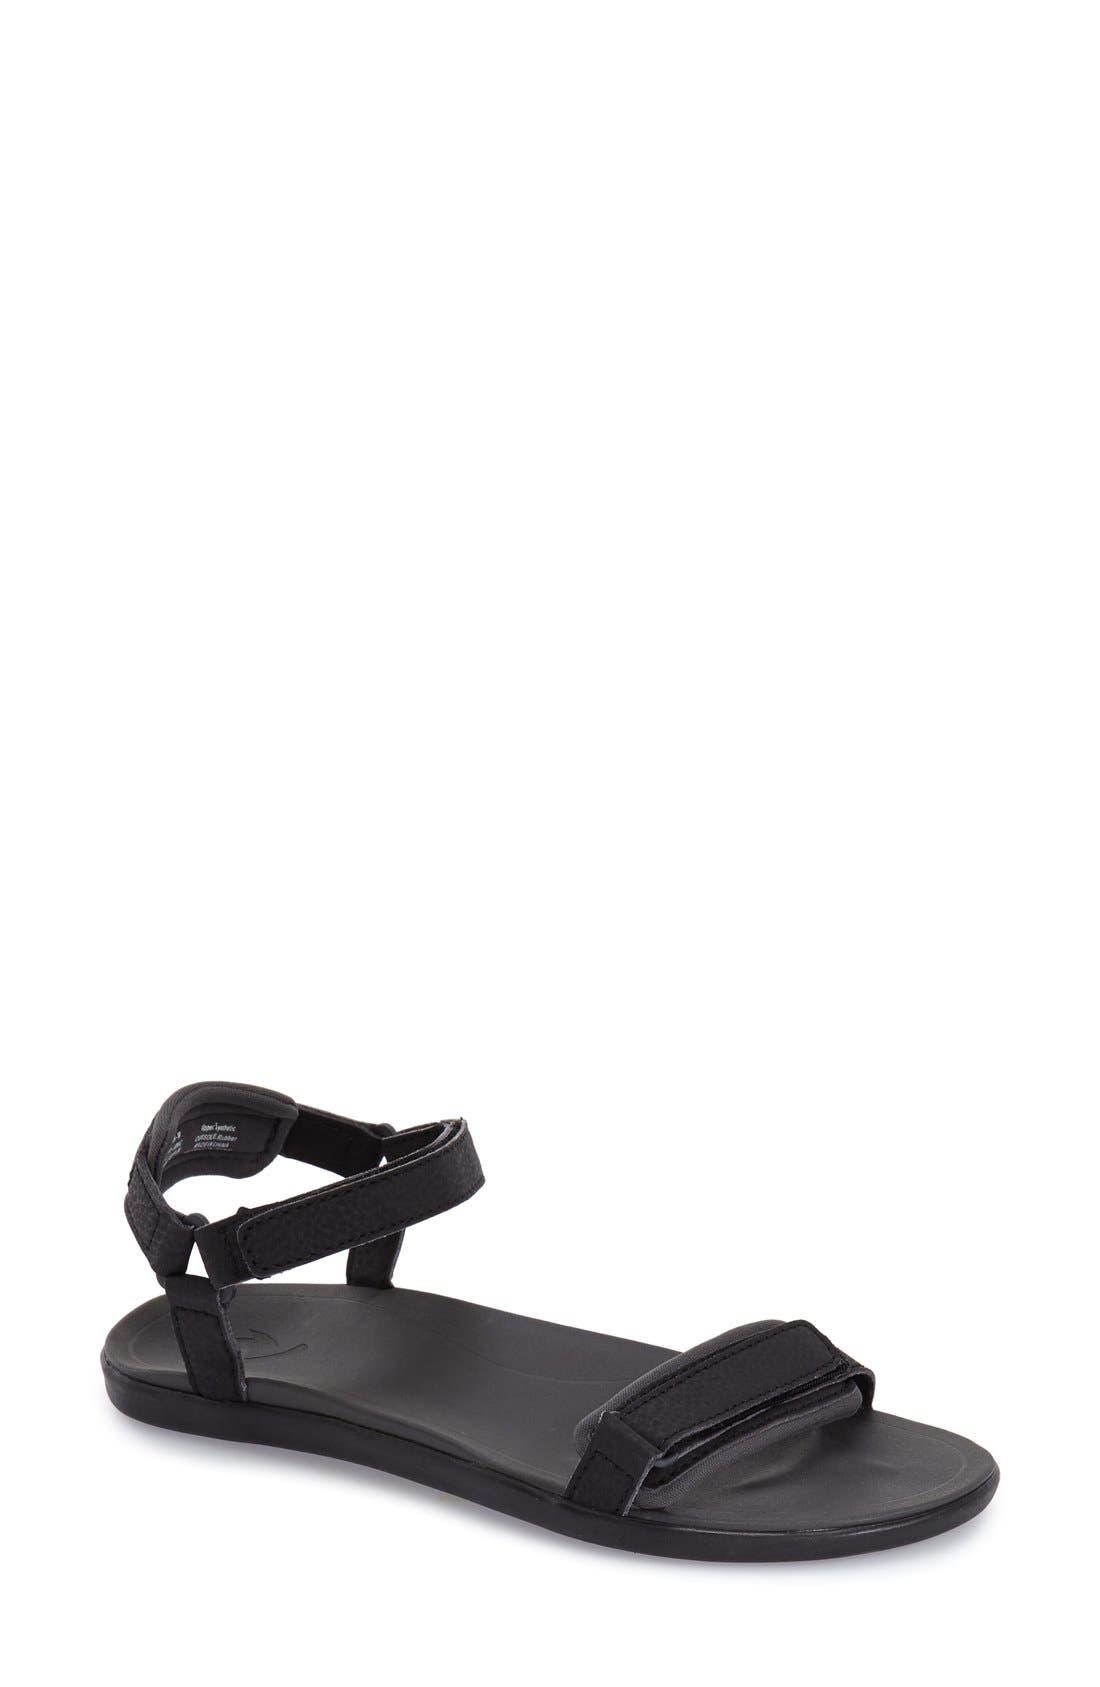 'Luana' Sandal,                             Main thumbnail 1, color,                             Black Faux Leather